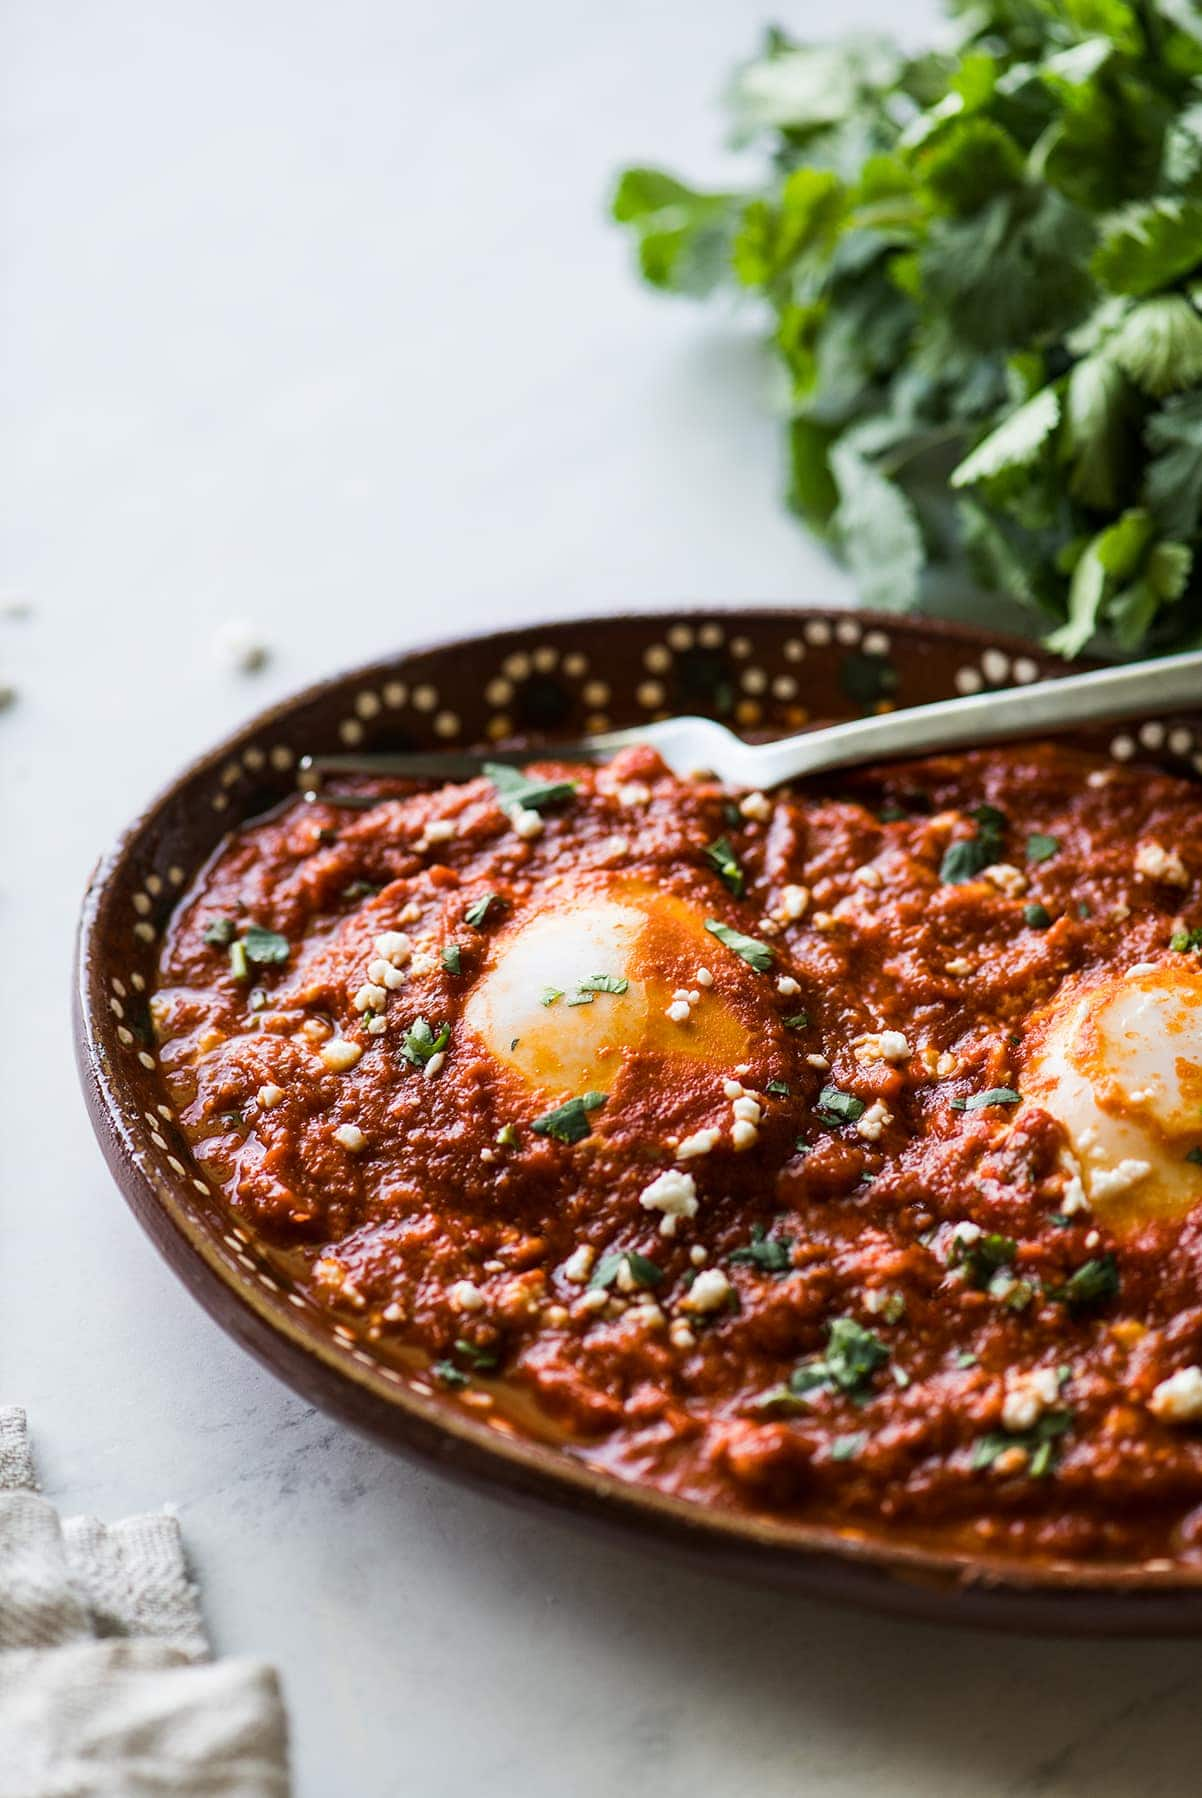 Huevos ahogados in a red salsa.